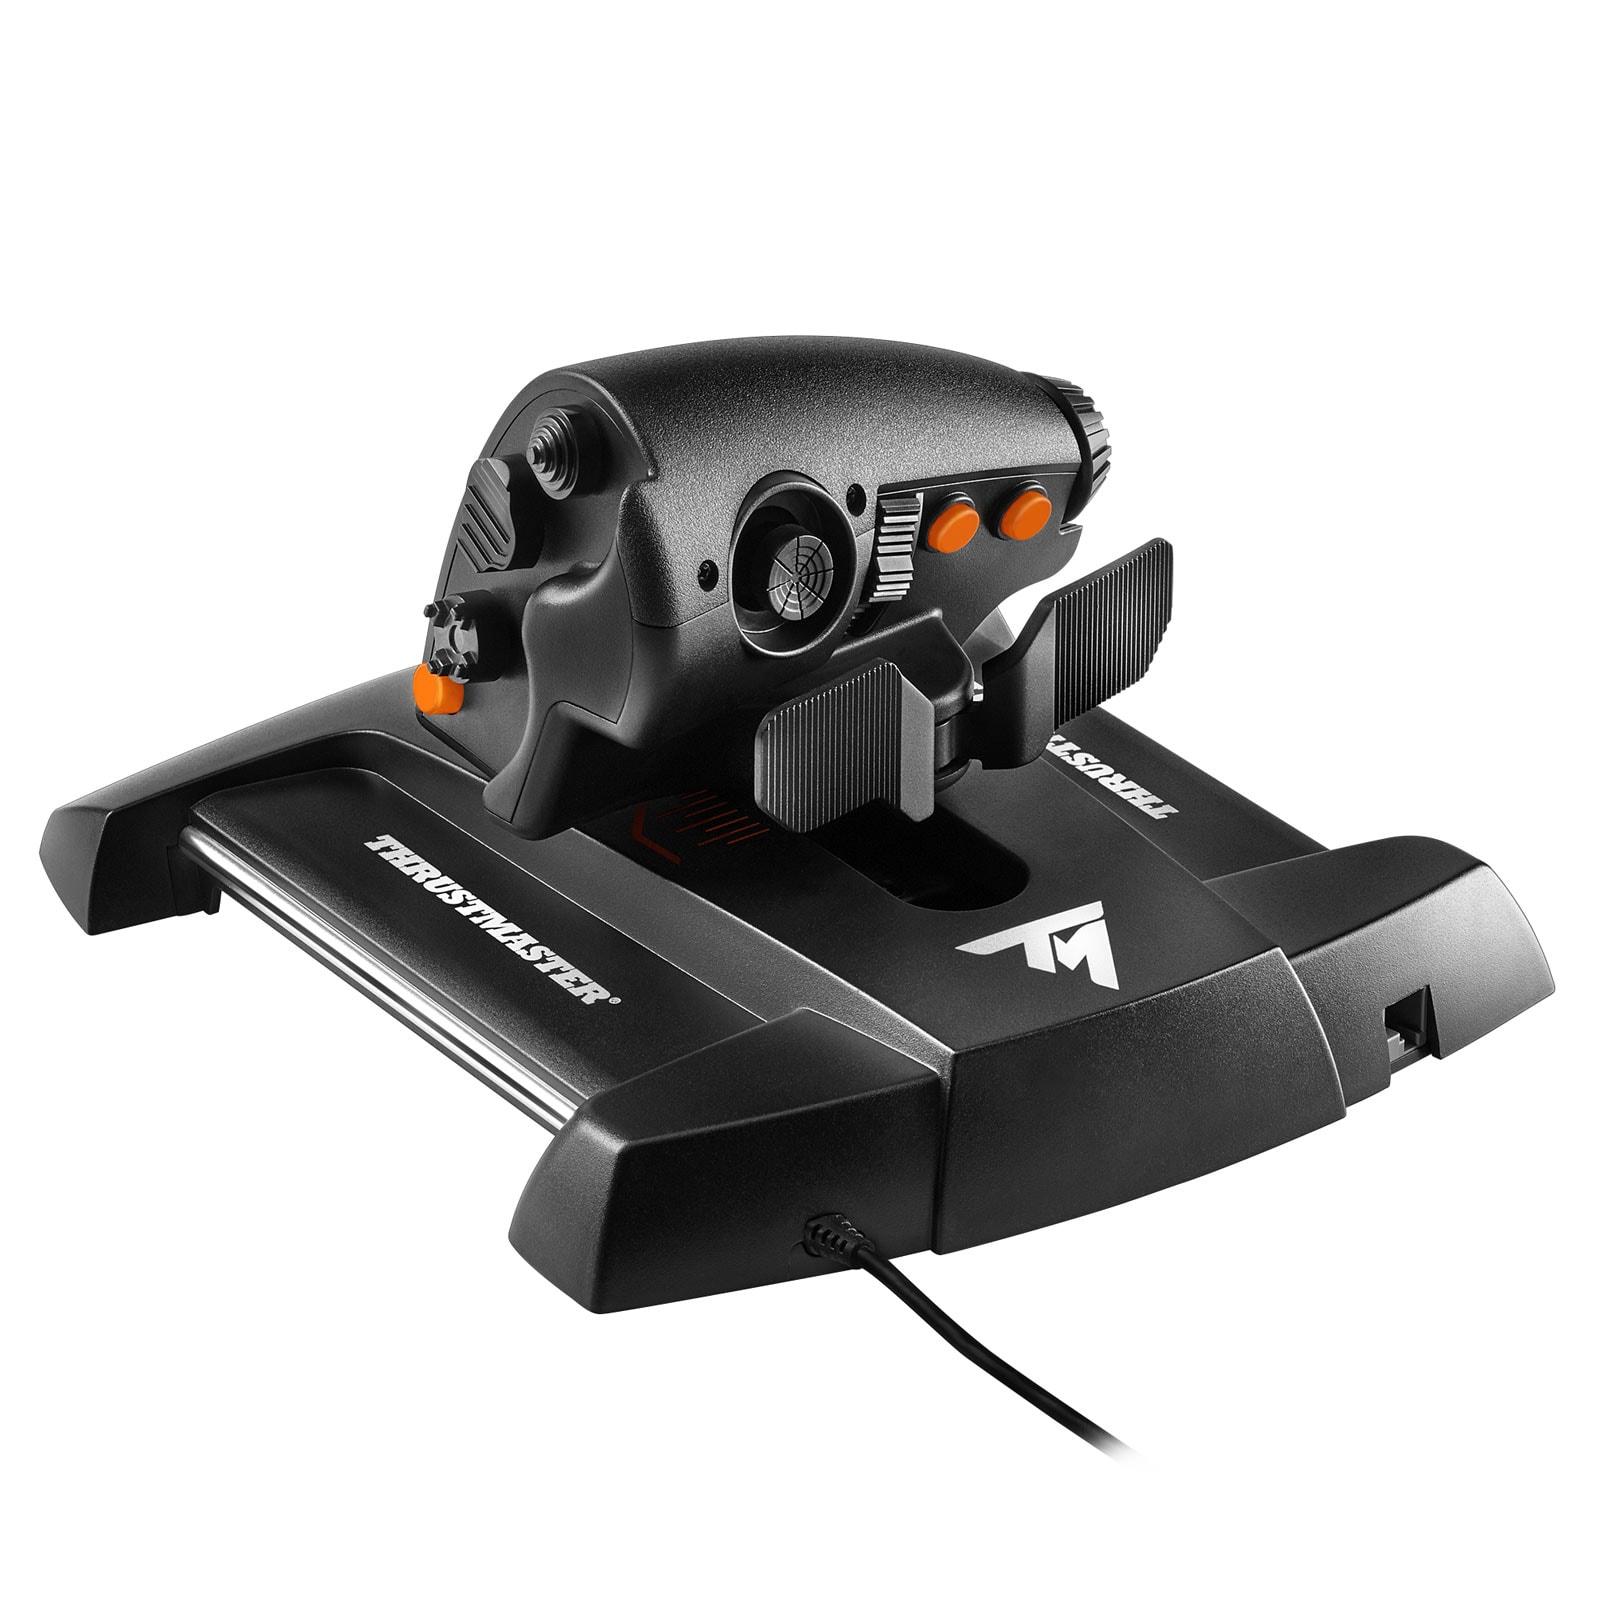 ThrustMaster TWCS Throttle - Périphérique de jeu - Cybertek.fr - 0